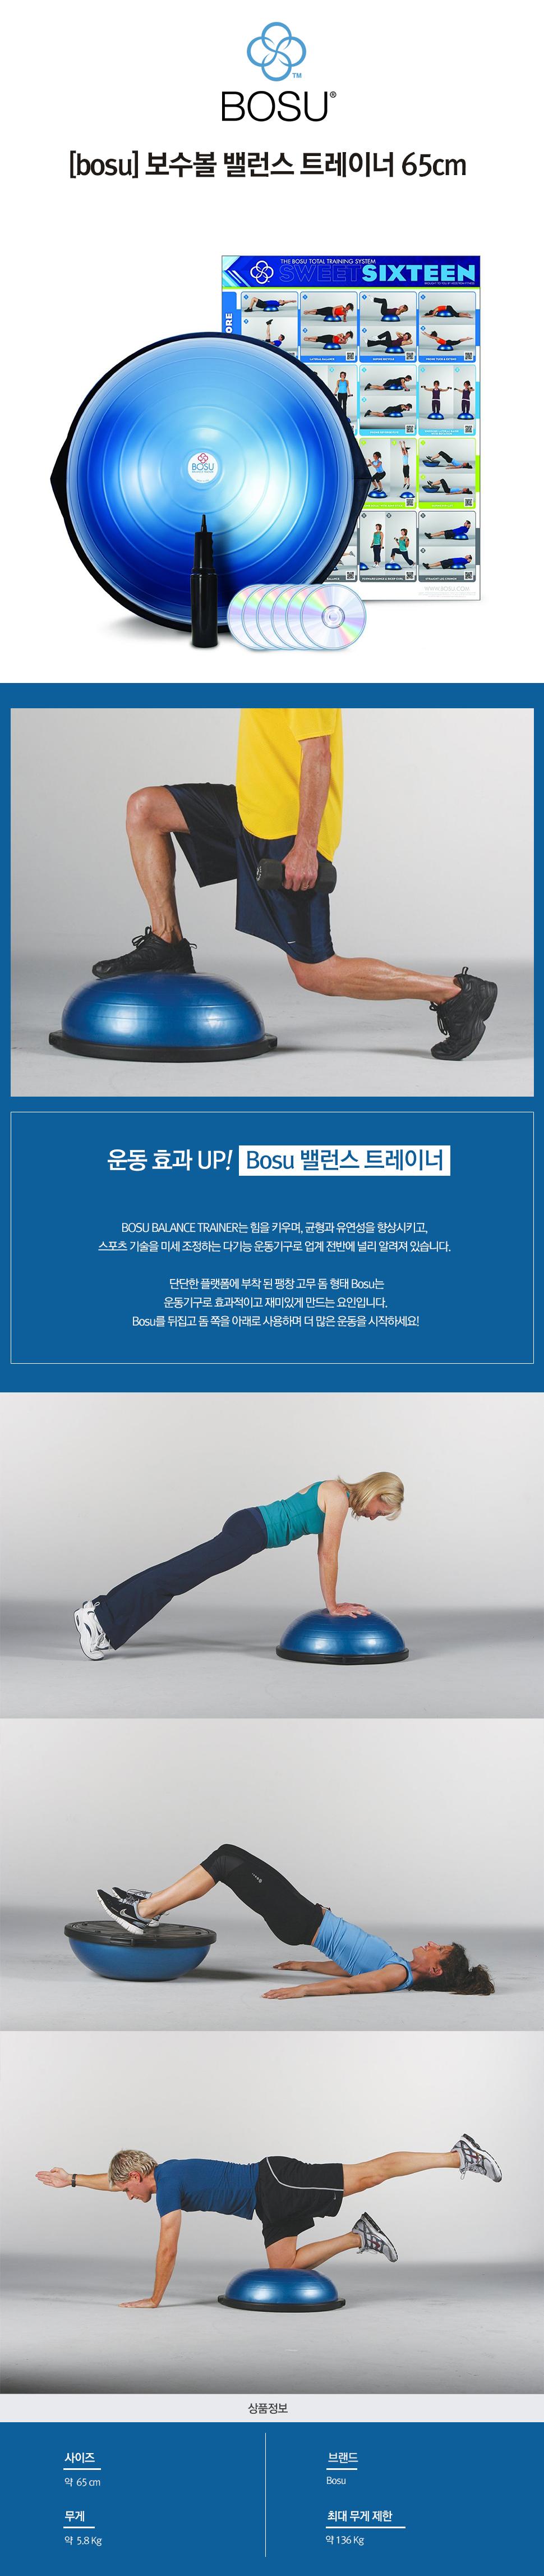 [bosu]-보수볼-Balance-Trainer.jpg